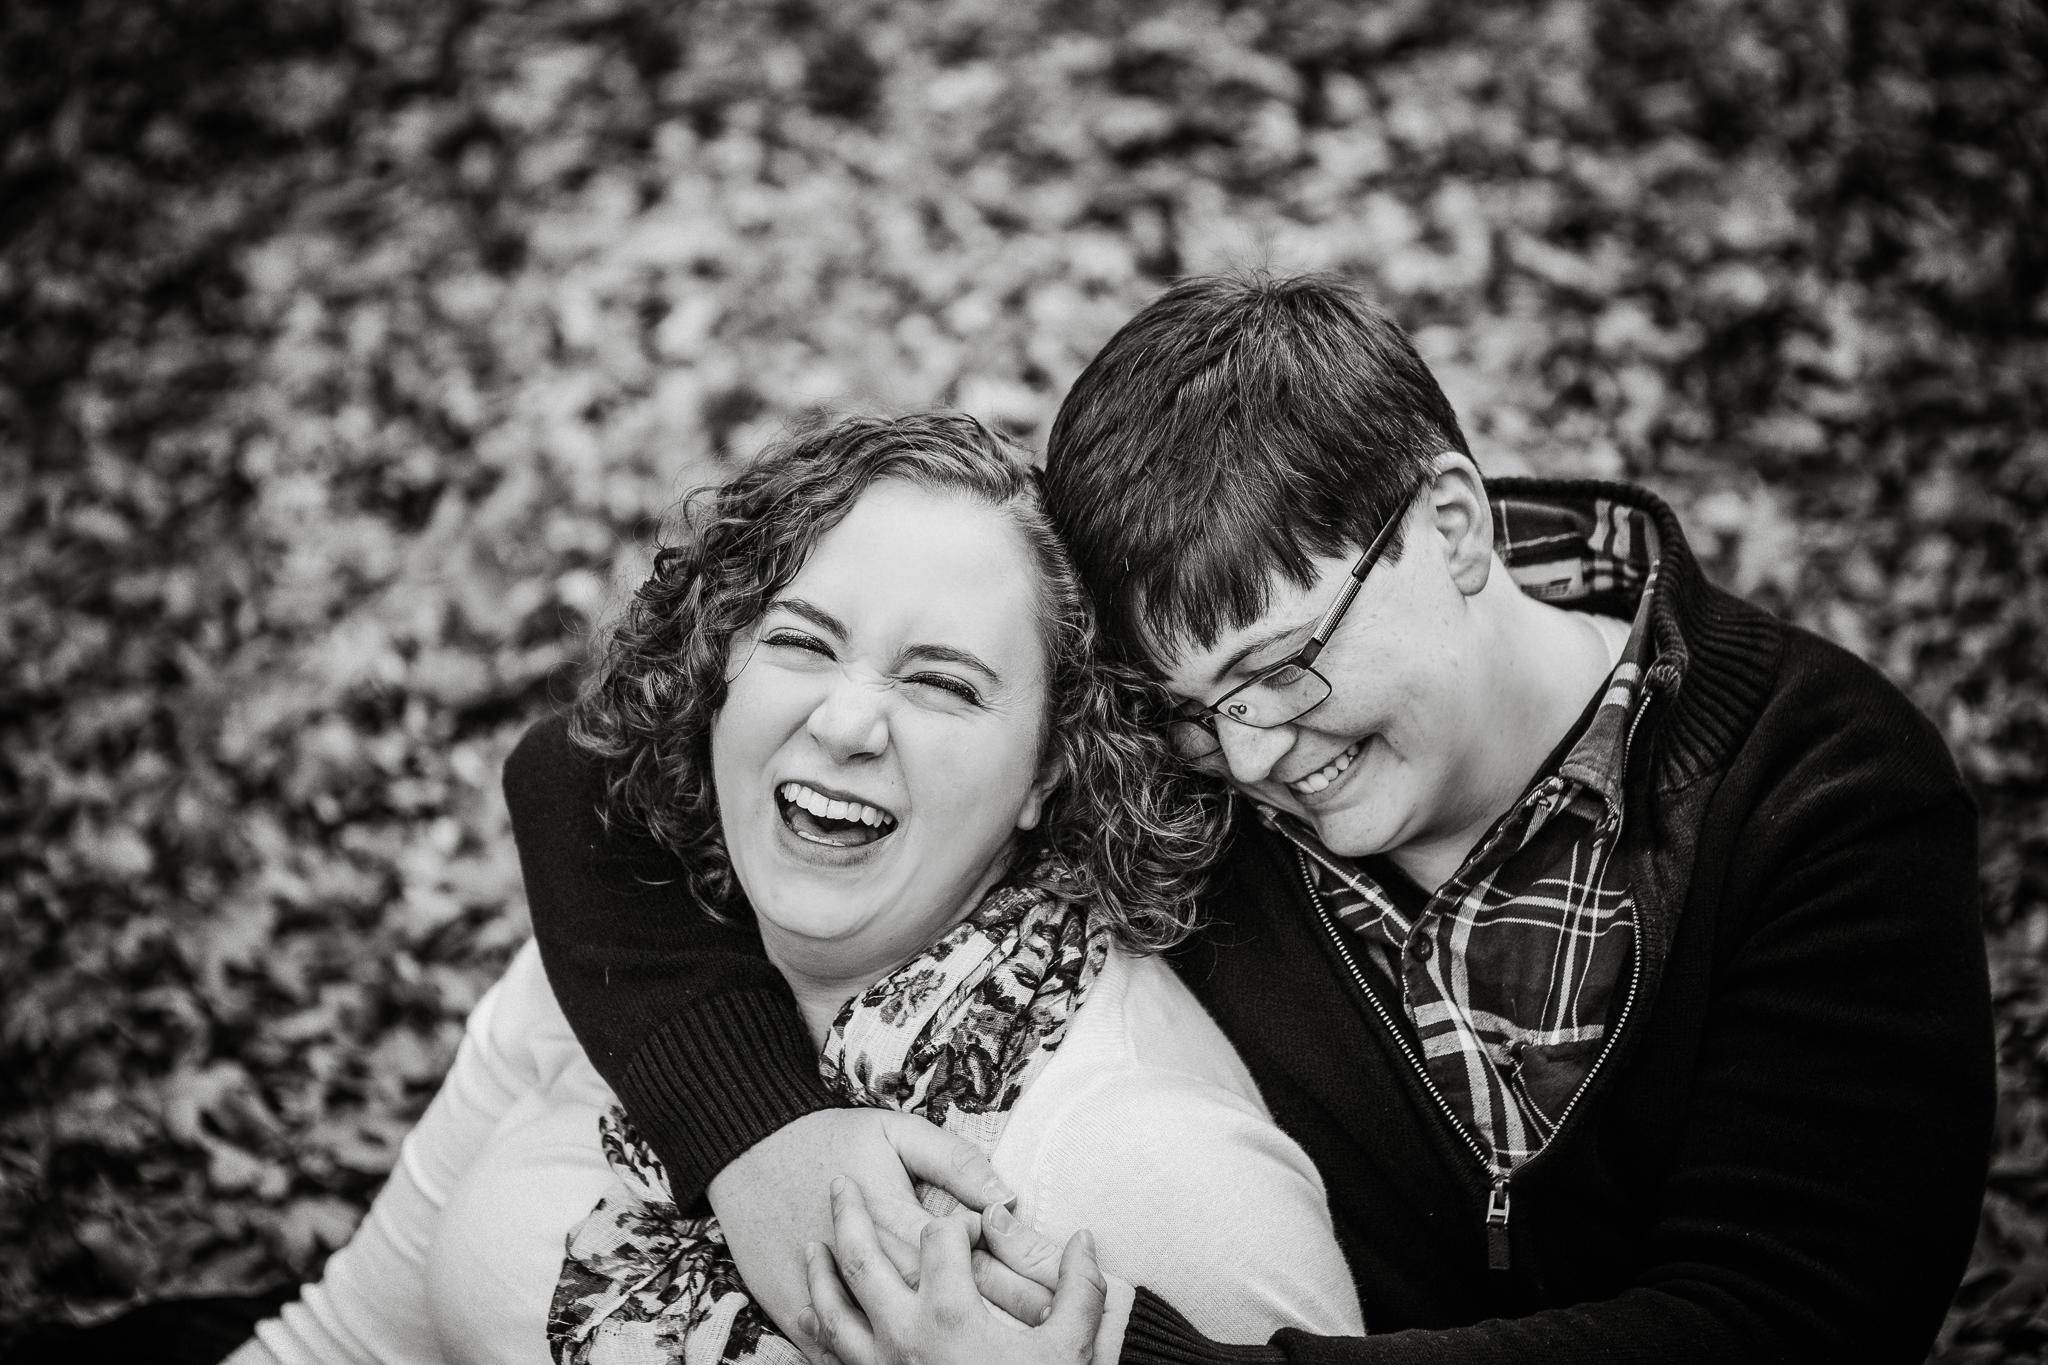 Richmond Kentucky Engagement Photographer - Ariana Jordan Photography -30.jpg